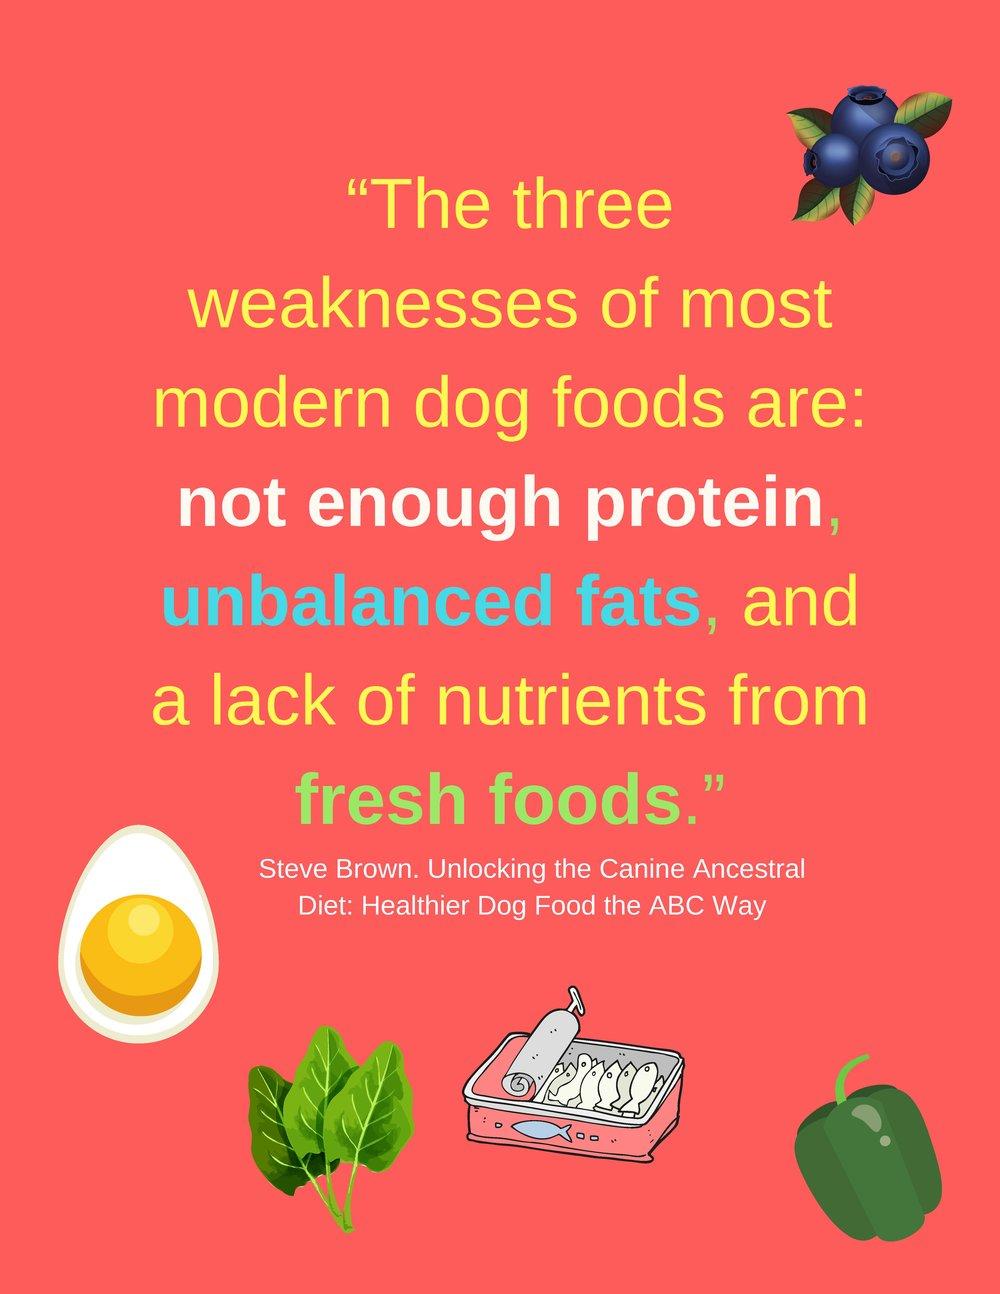 """Dogs, like people, need some fresh whole foods."".jpg"